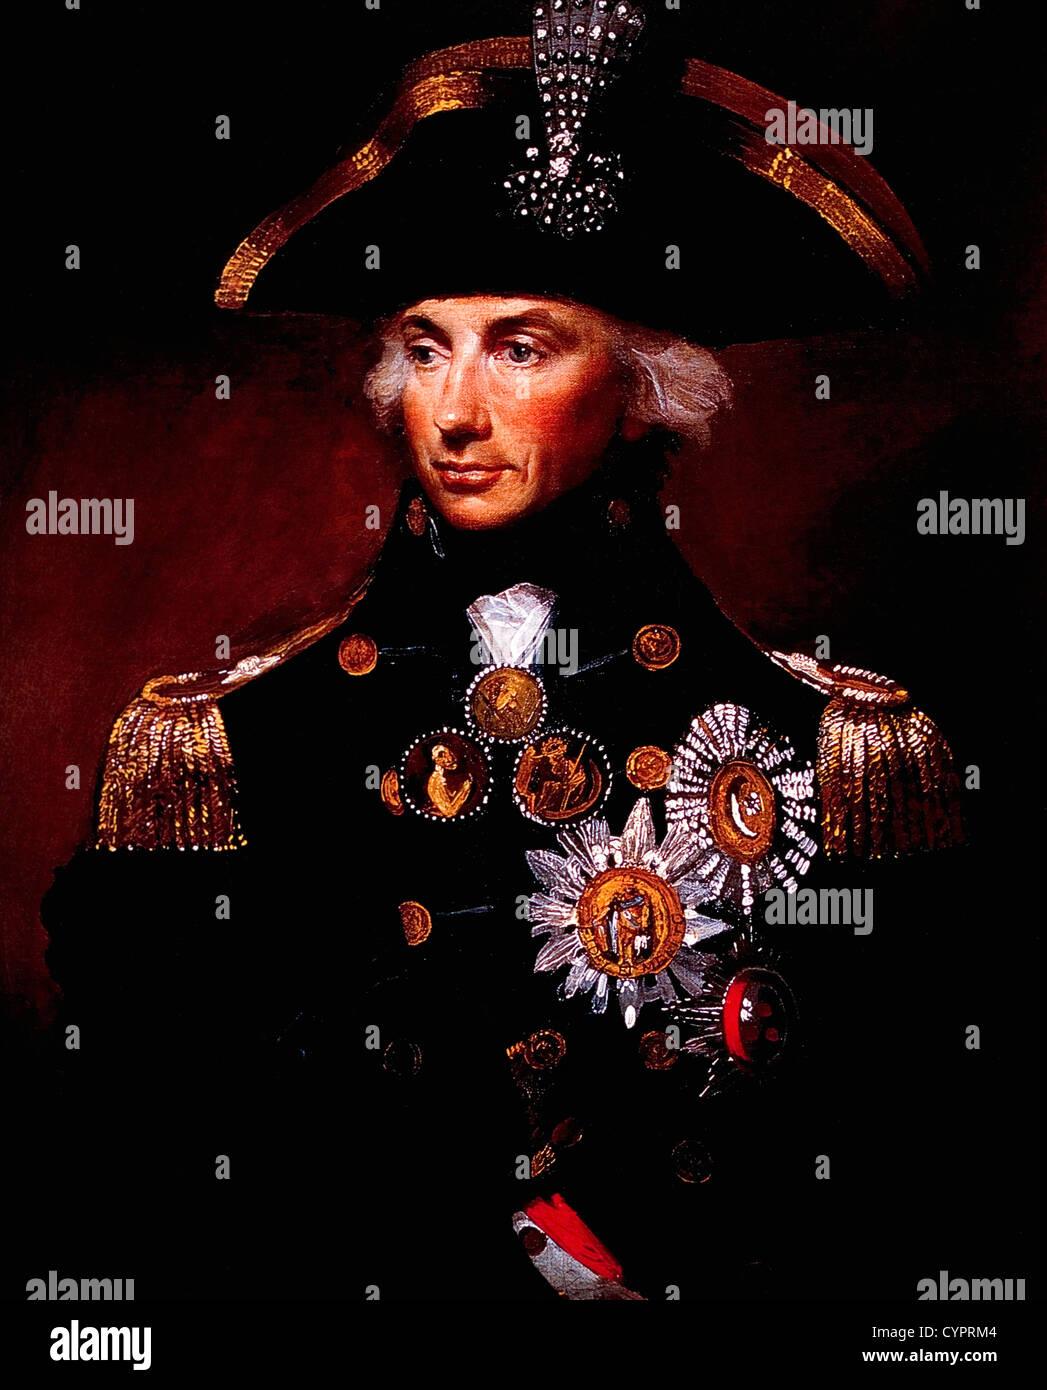 Horatio Nelson (1758-1805), British Admiral, Portrait by Lemuel Francis Abbott, 1798 - Stock Image